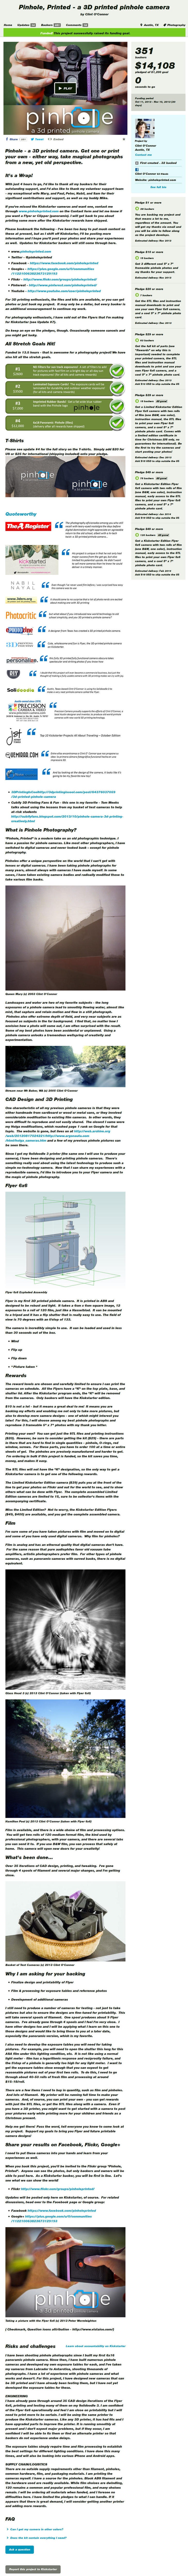 pinhole_printed_3d_printed_pinhole_camera_kickstarter_project